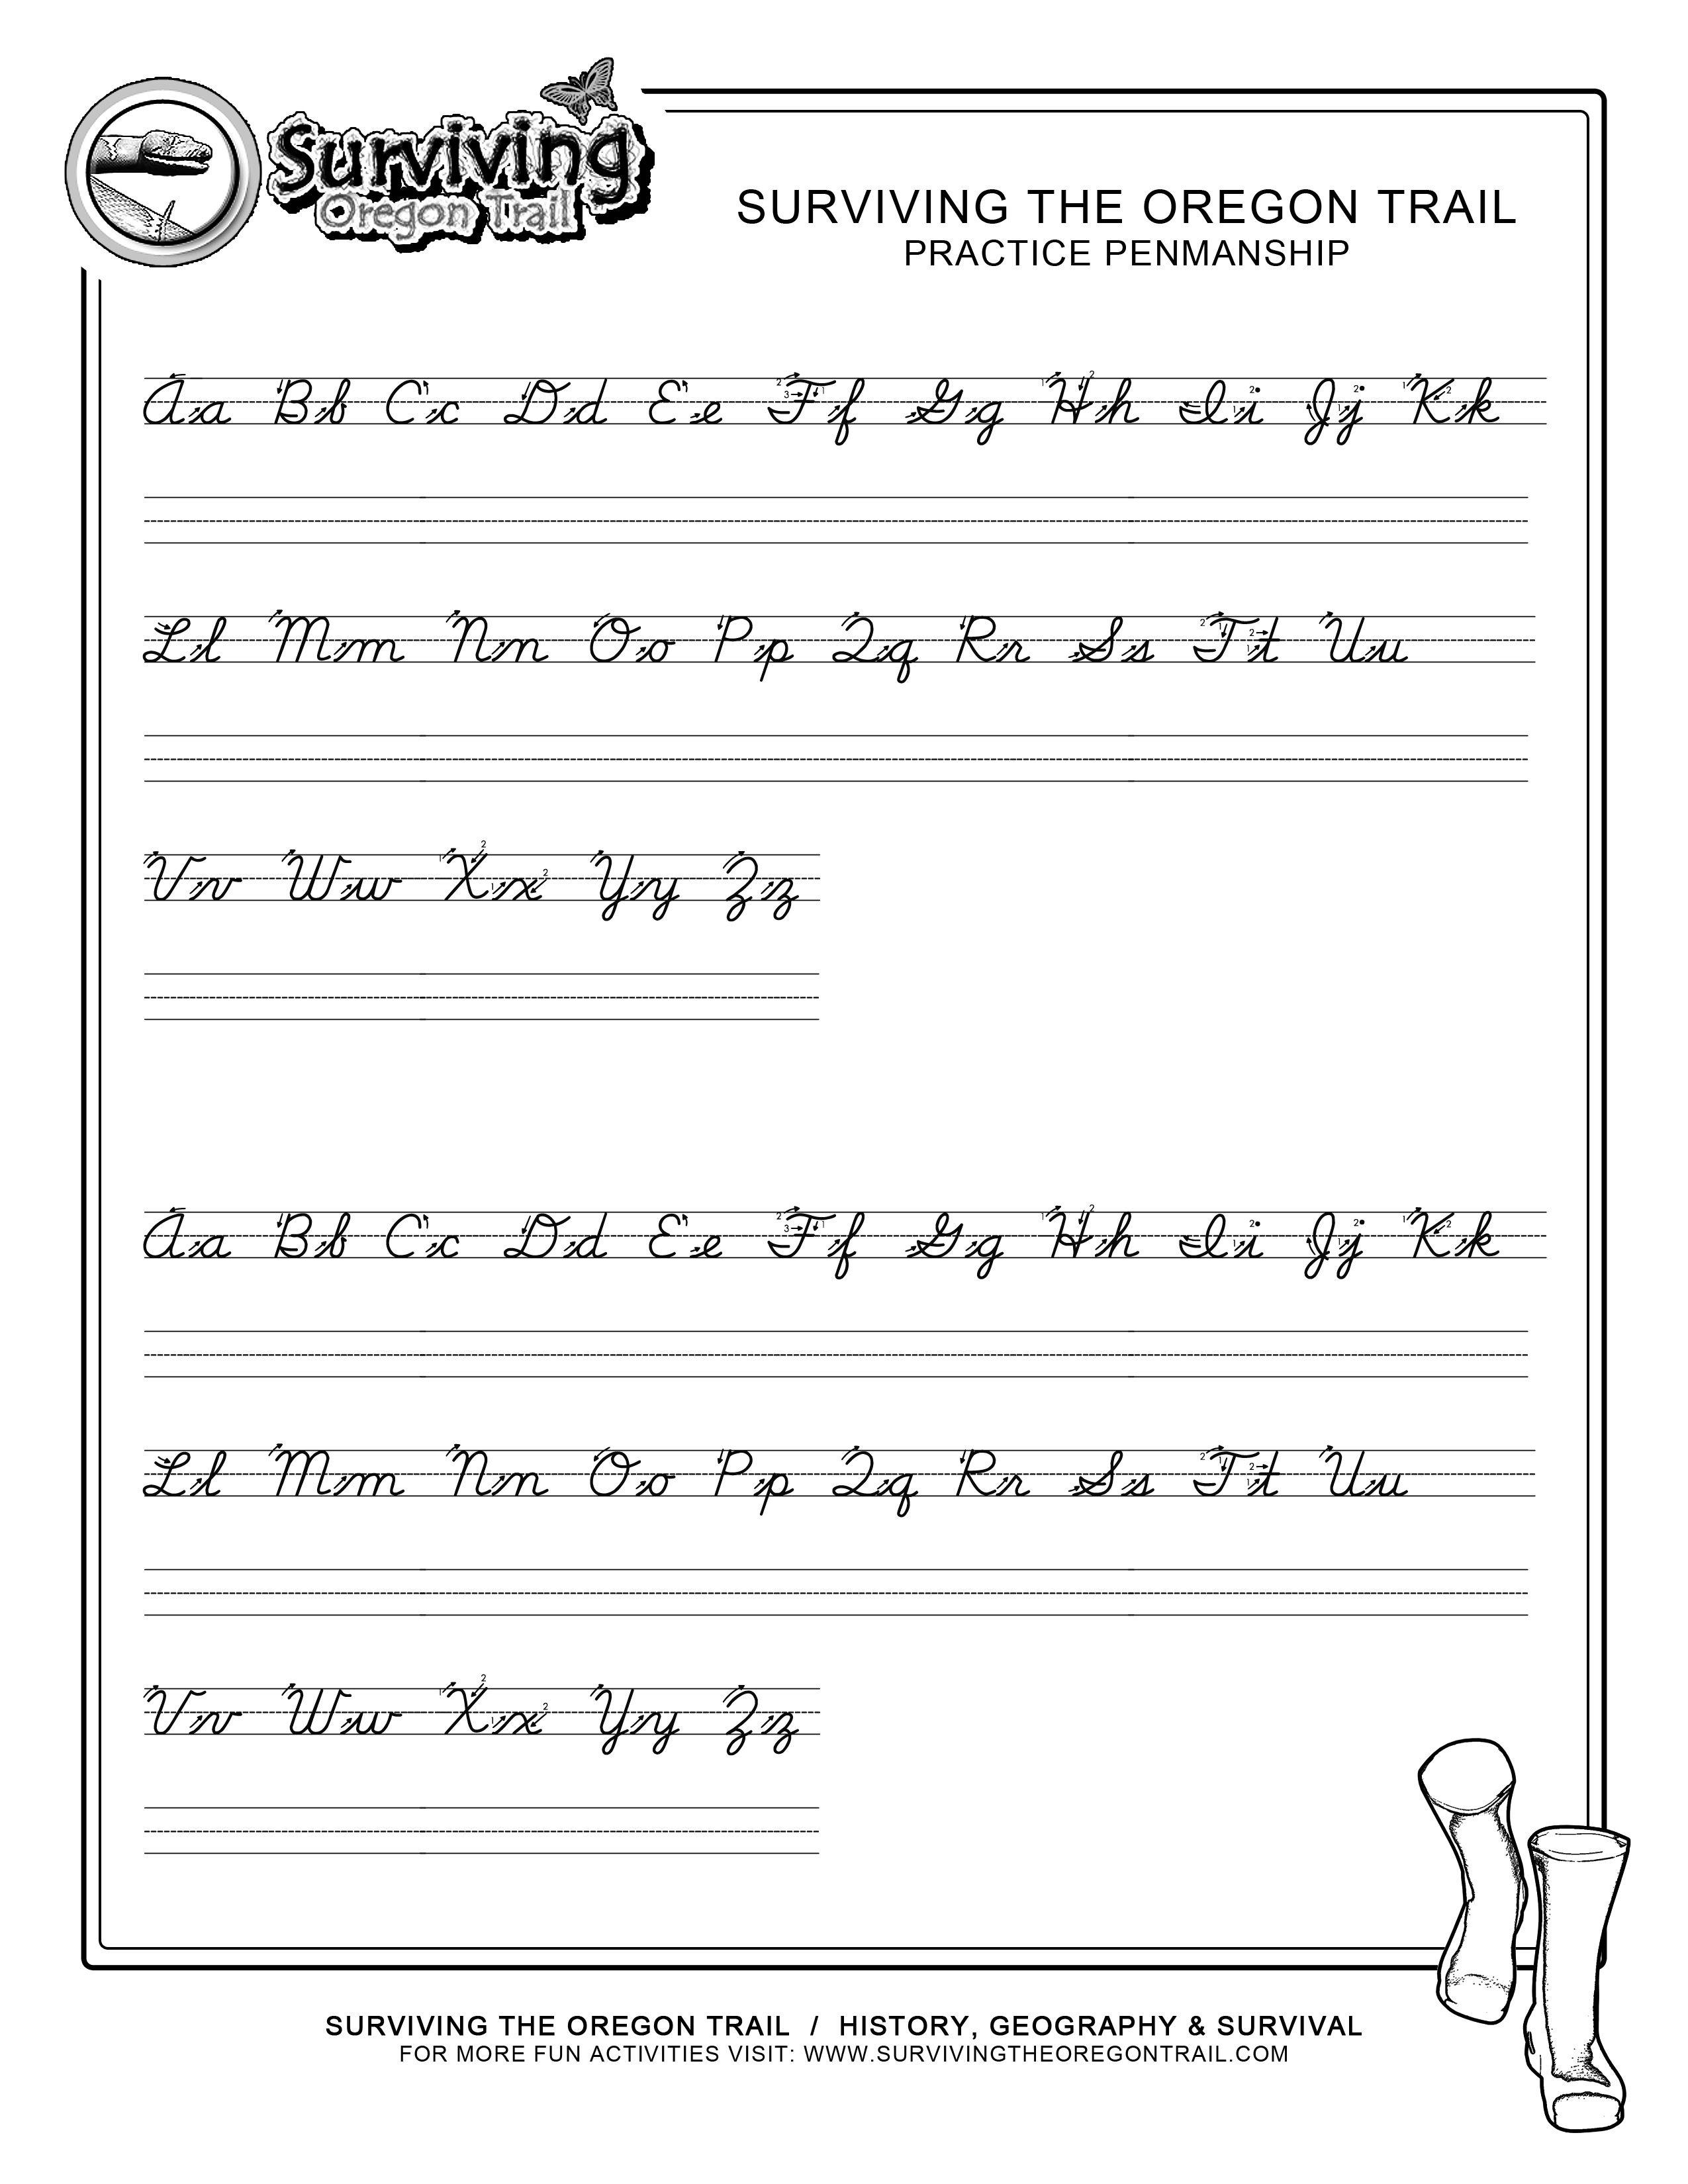 Practice Penmanship – Free Abc's Printable Cursive Writing Worksheet - Free Printable Writing Pages